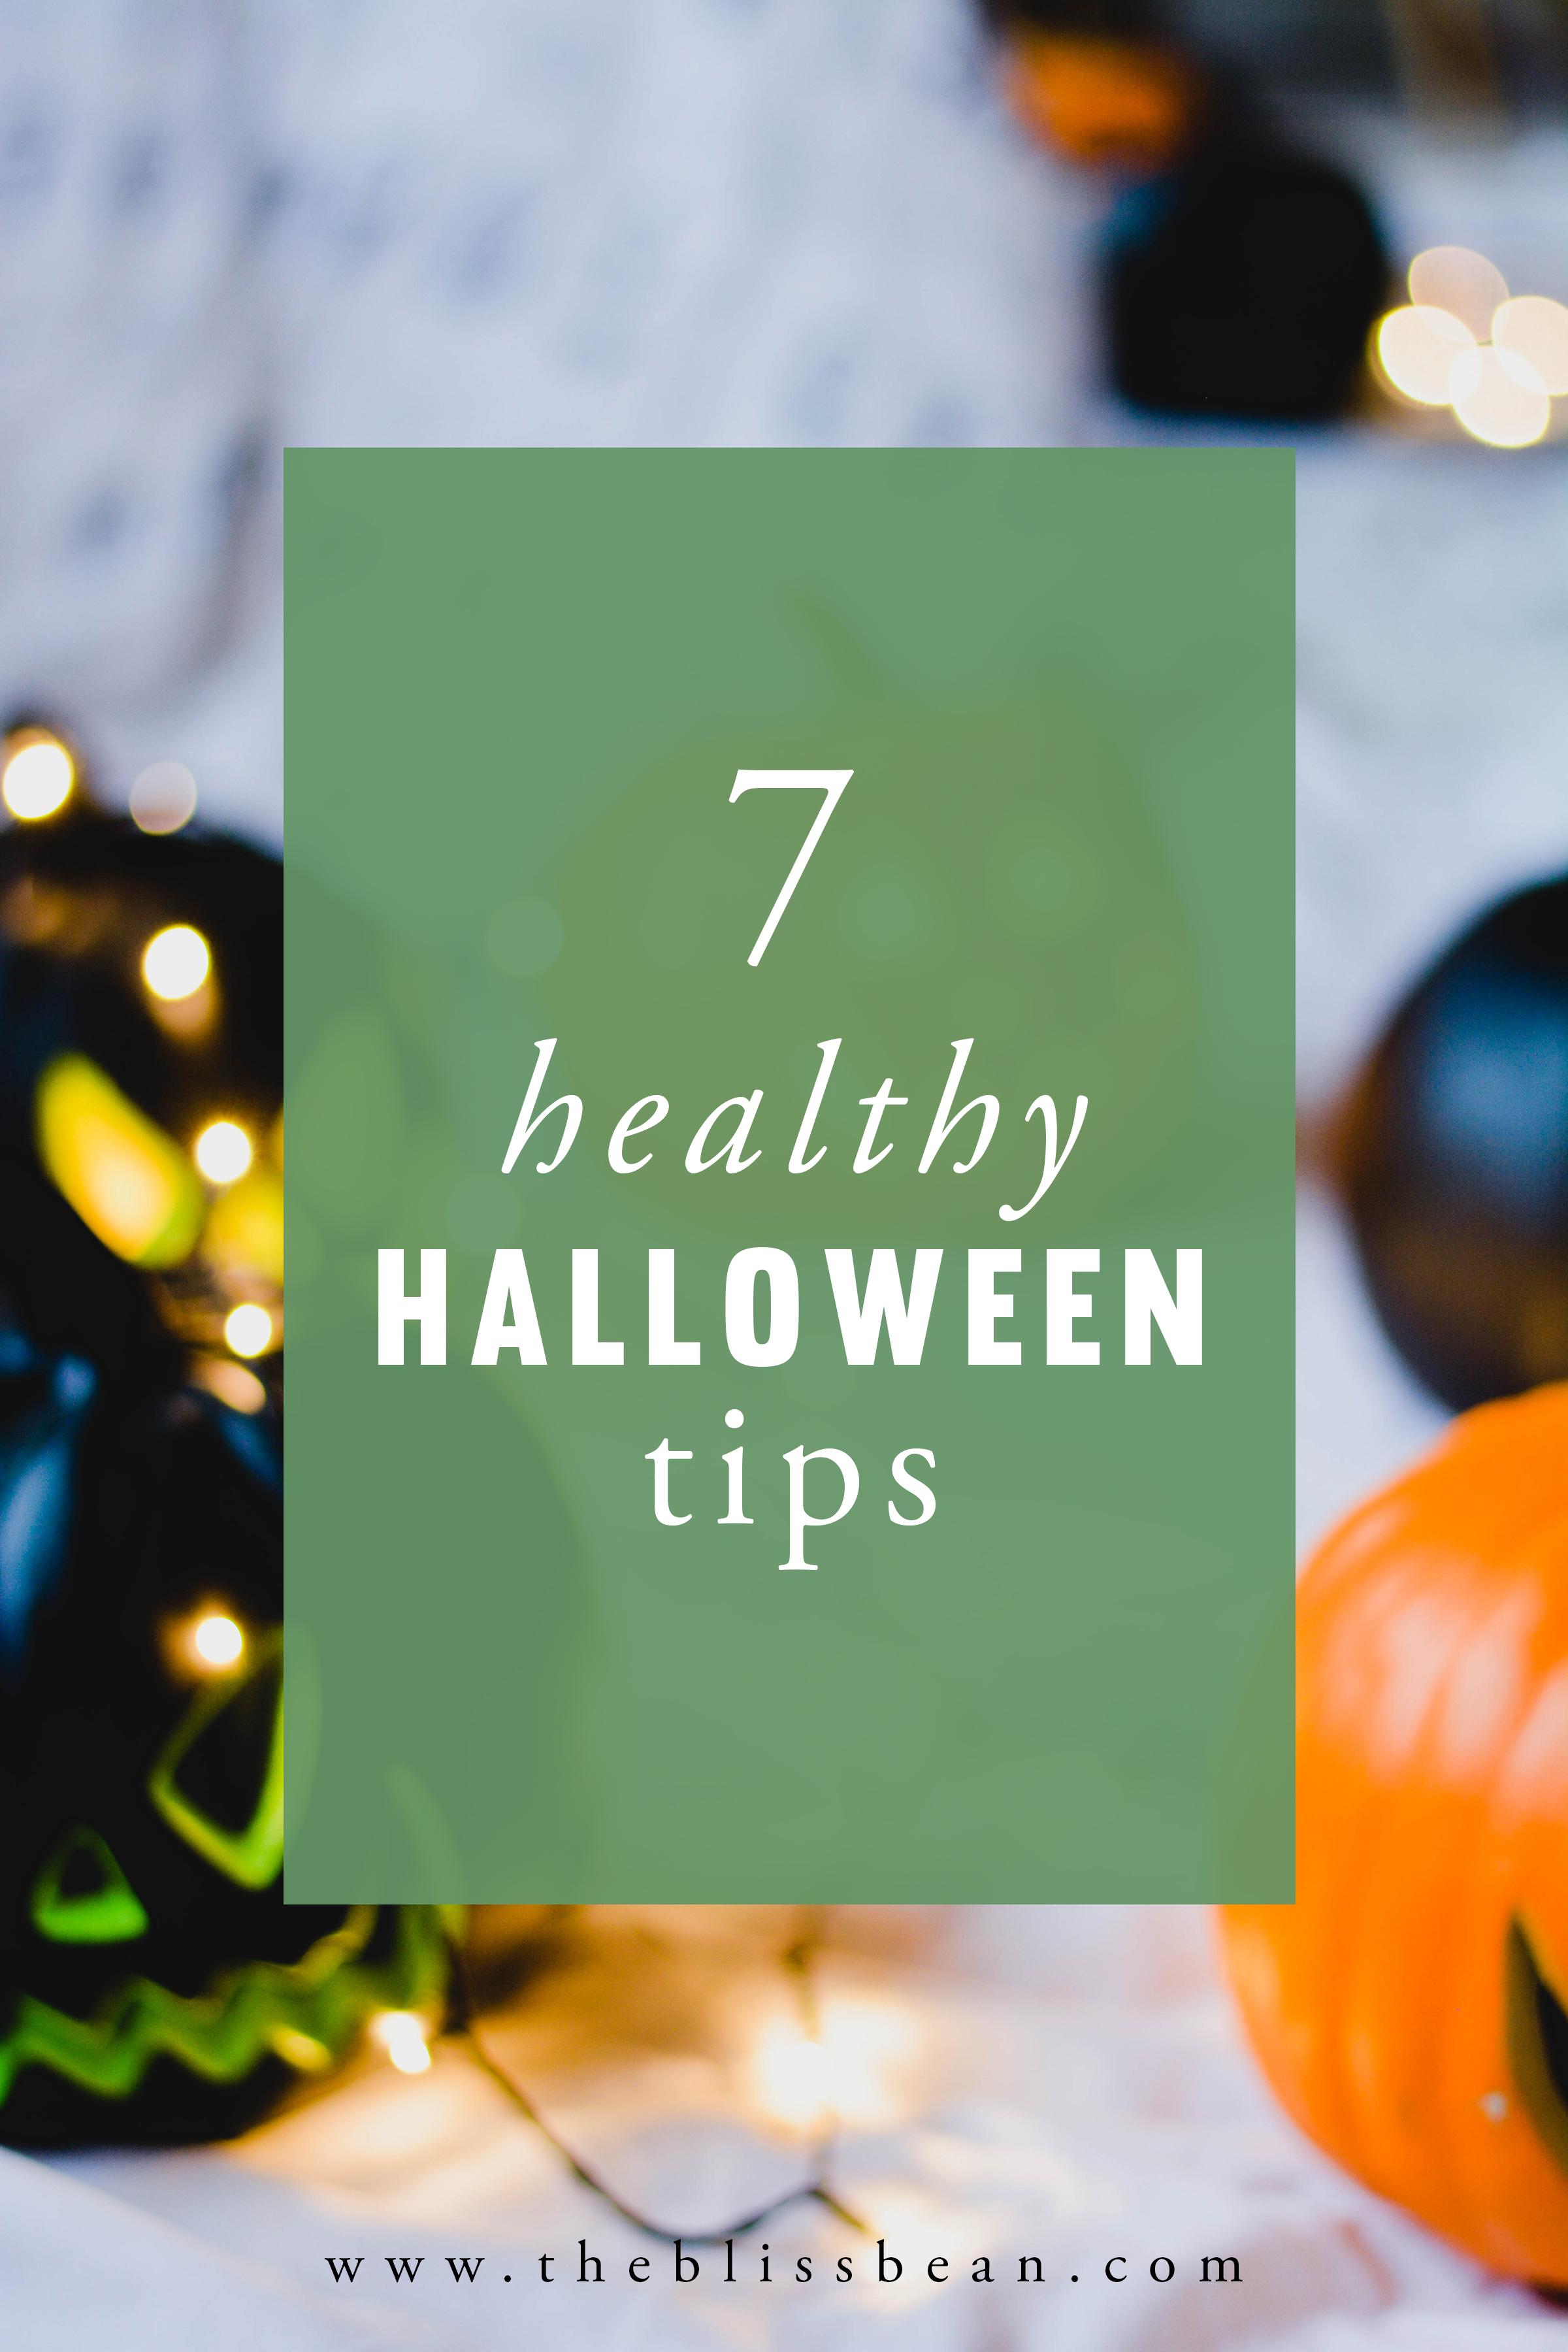 Healthy Halloween Tips Cover Photo.jpg